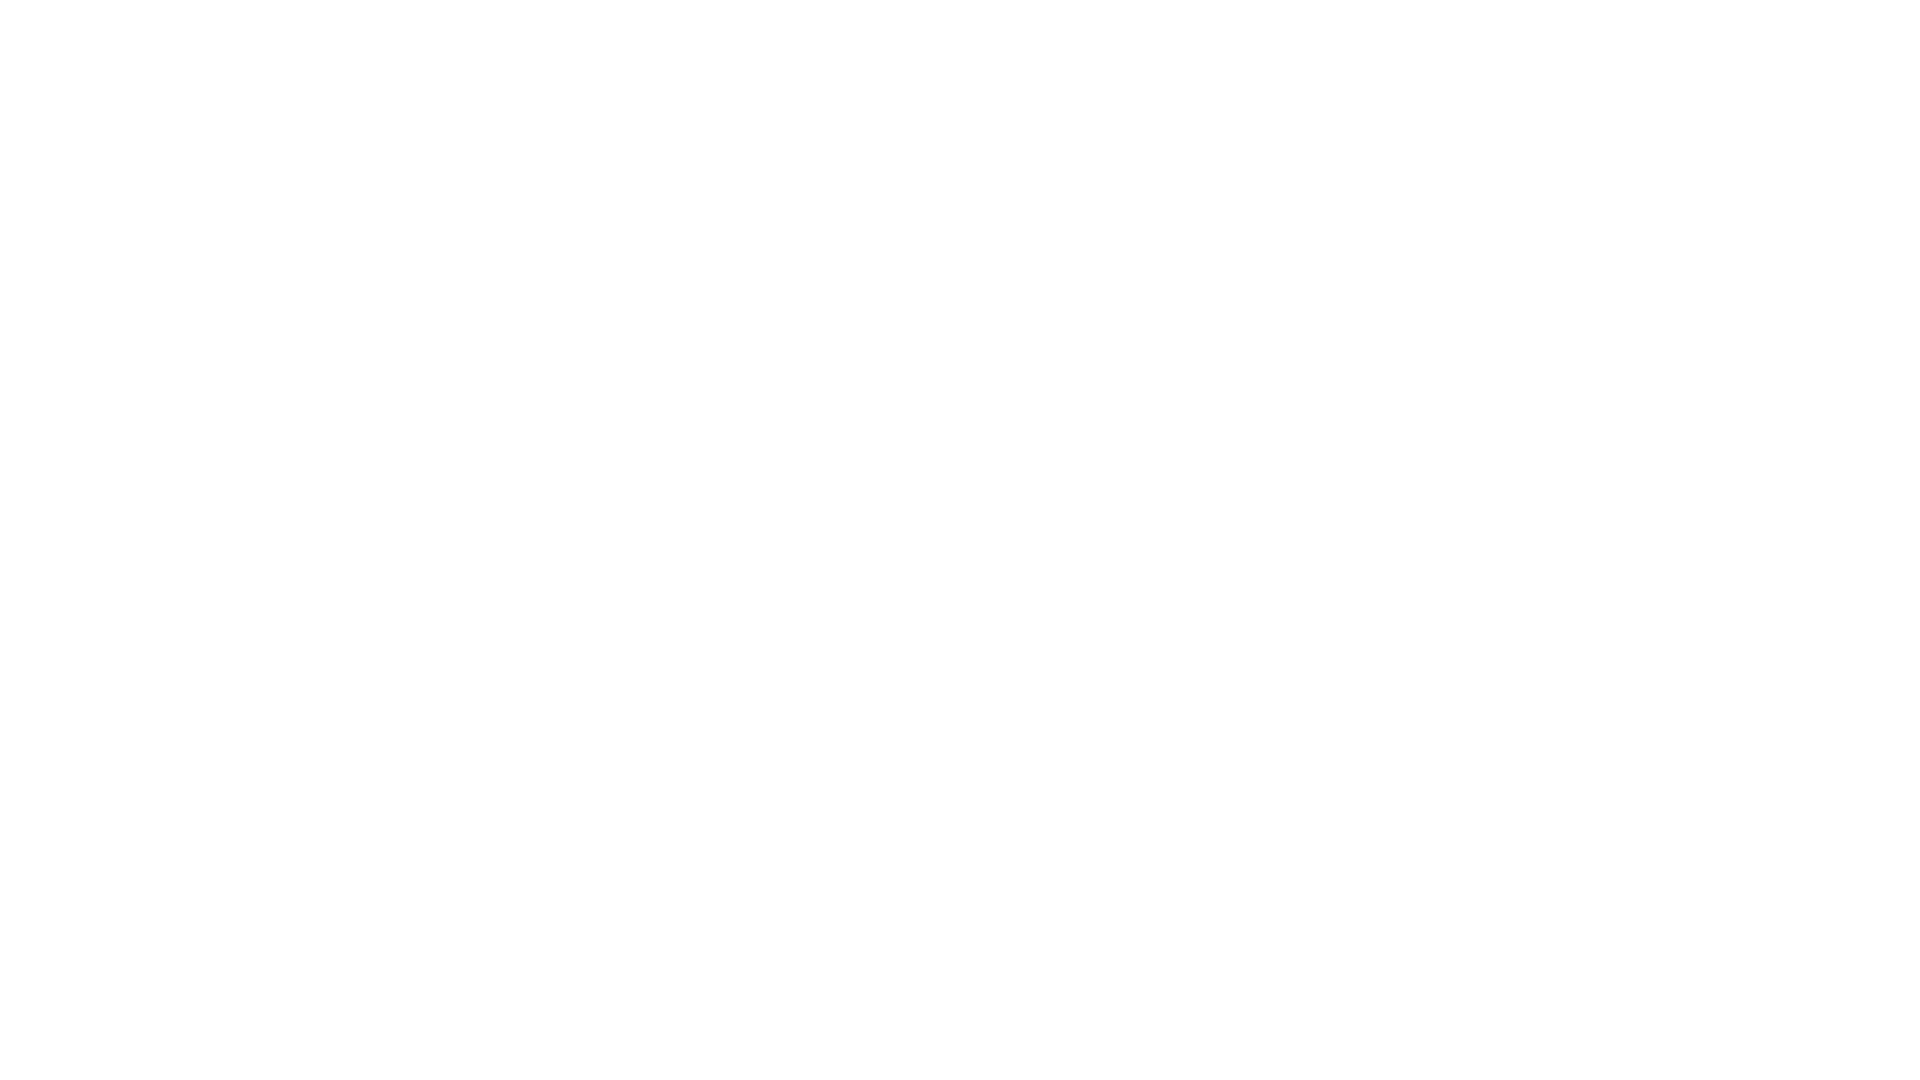 wallpaper_pattern_transparent.png